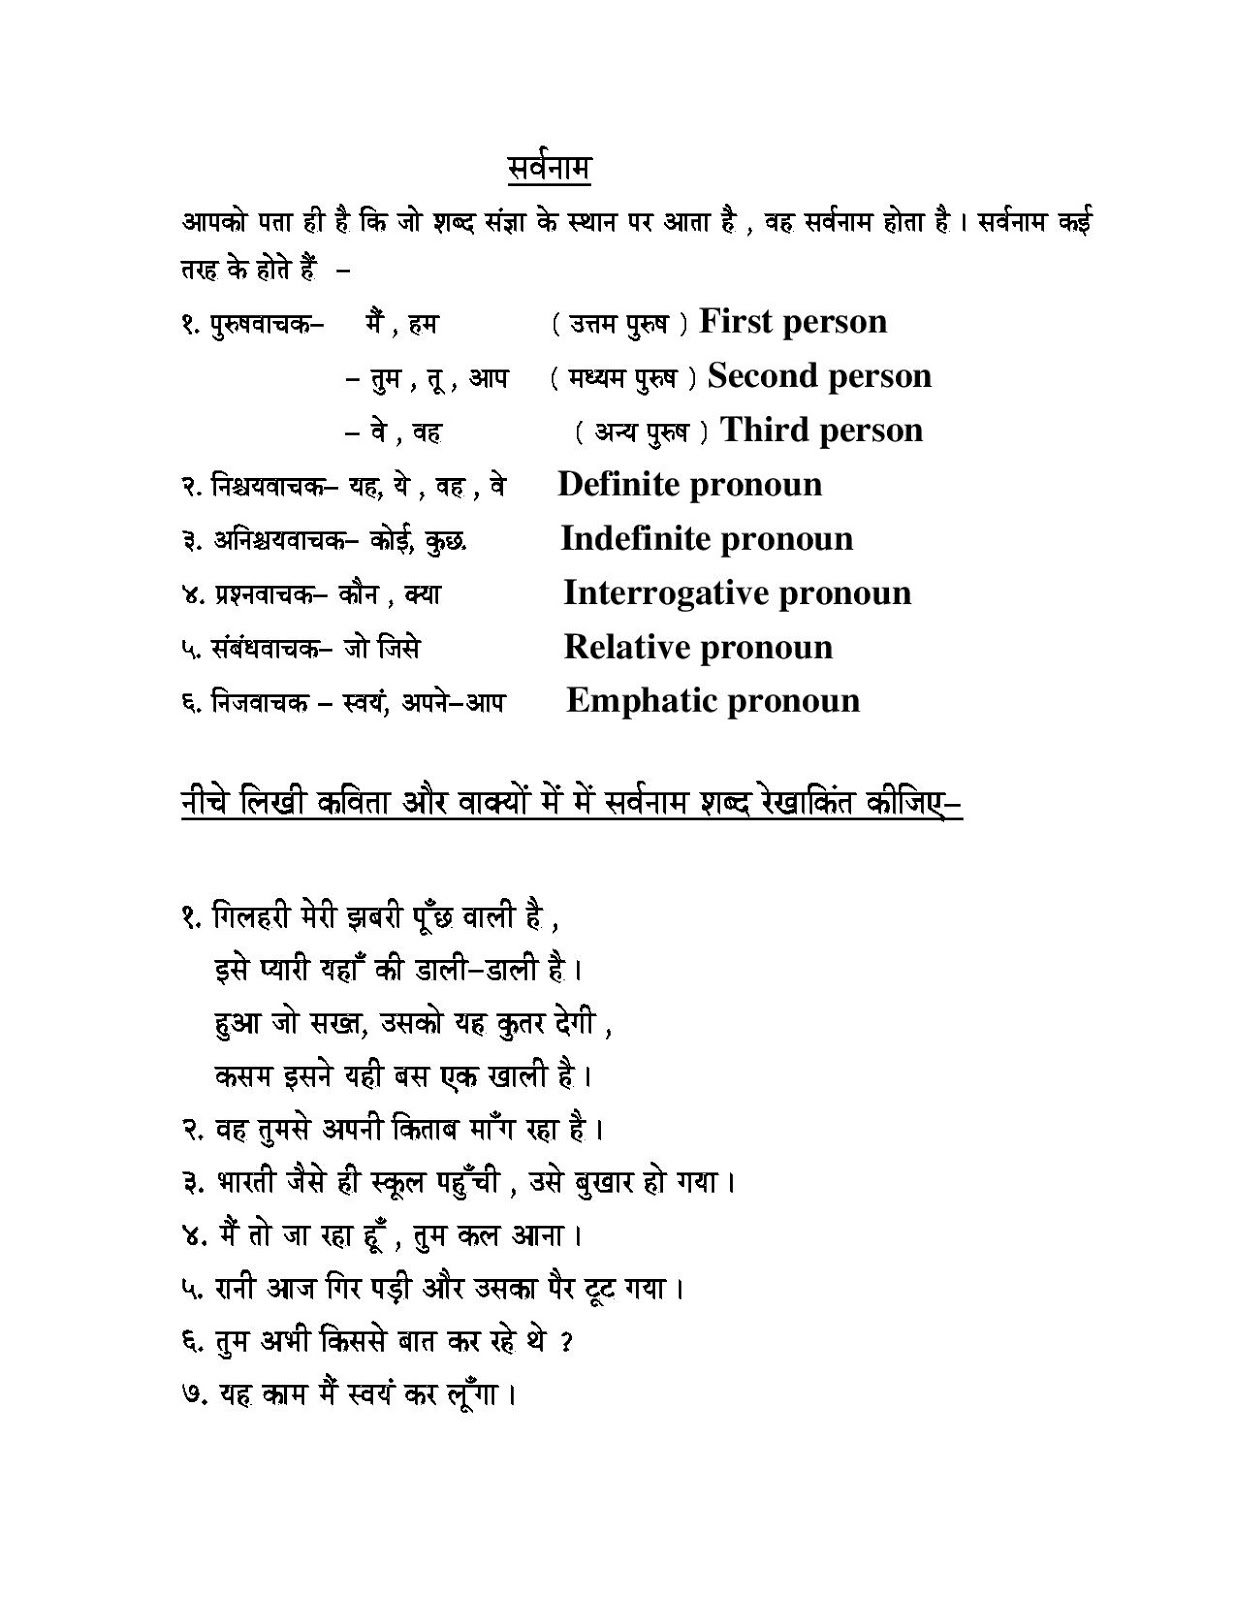 medium resolution of Pronoun Worksheet In Hindi   Printable Worksheets and Activities for  Teachers